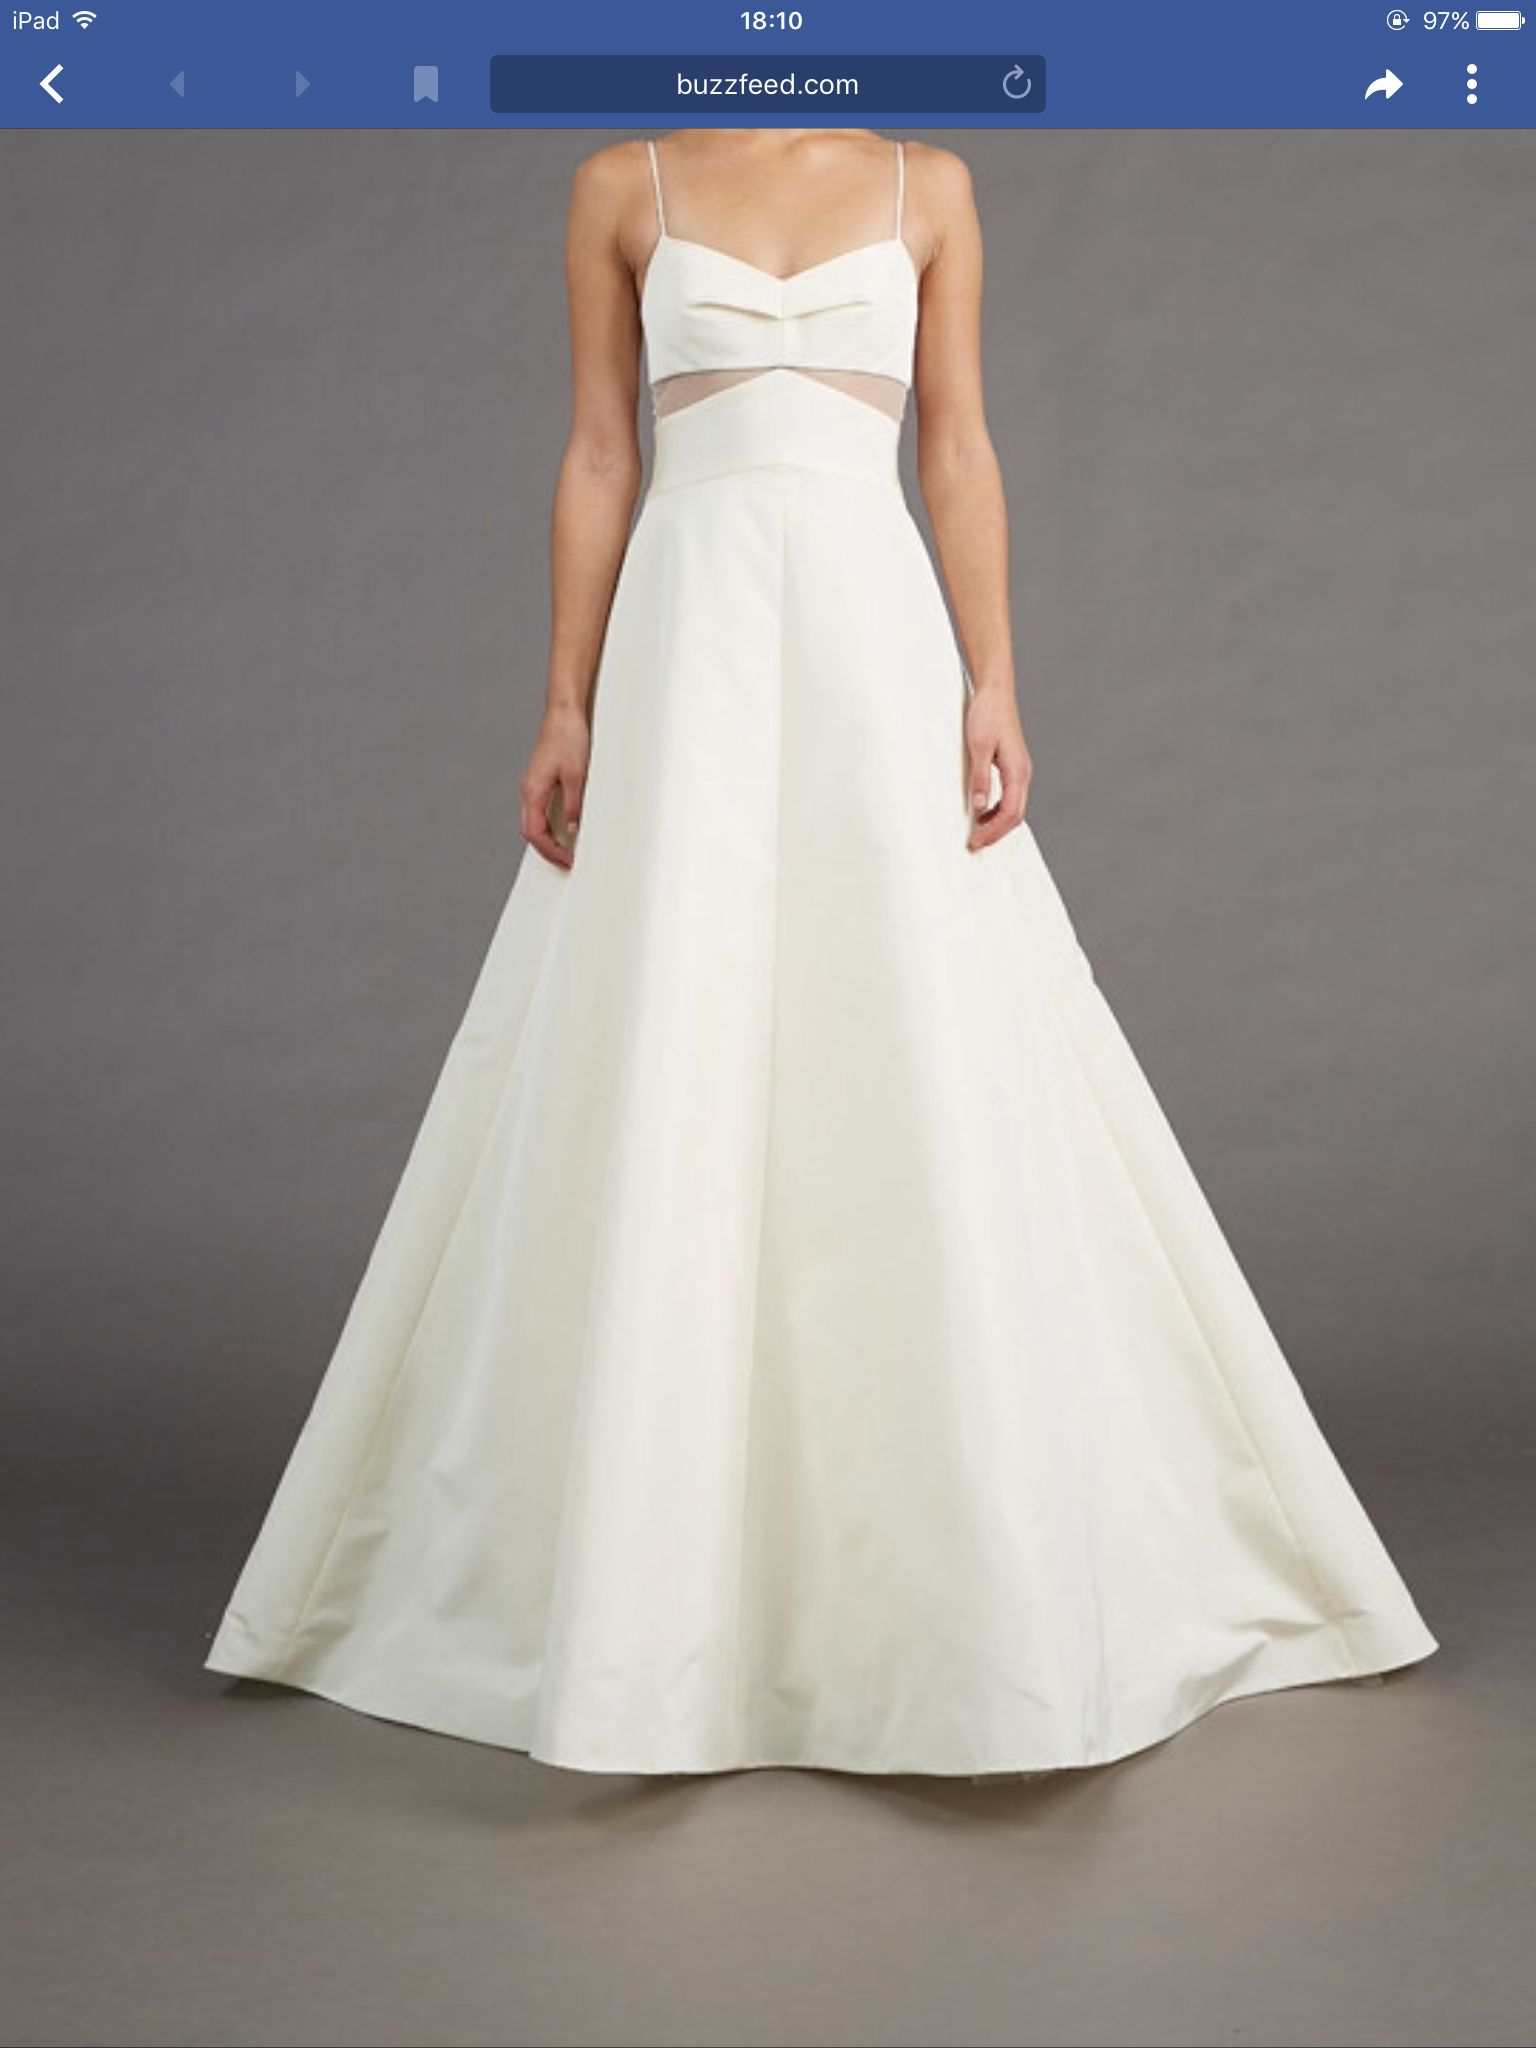 Love this wedding dress wedding ideas u dresses pinterest